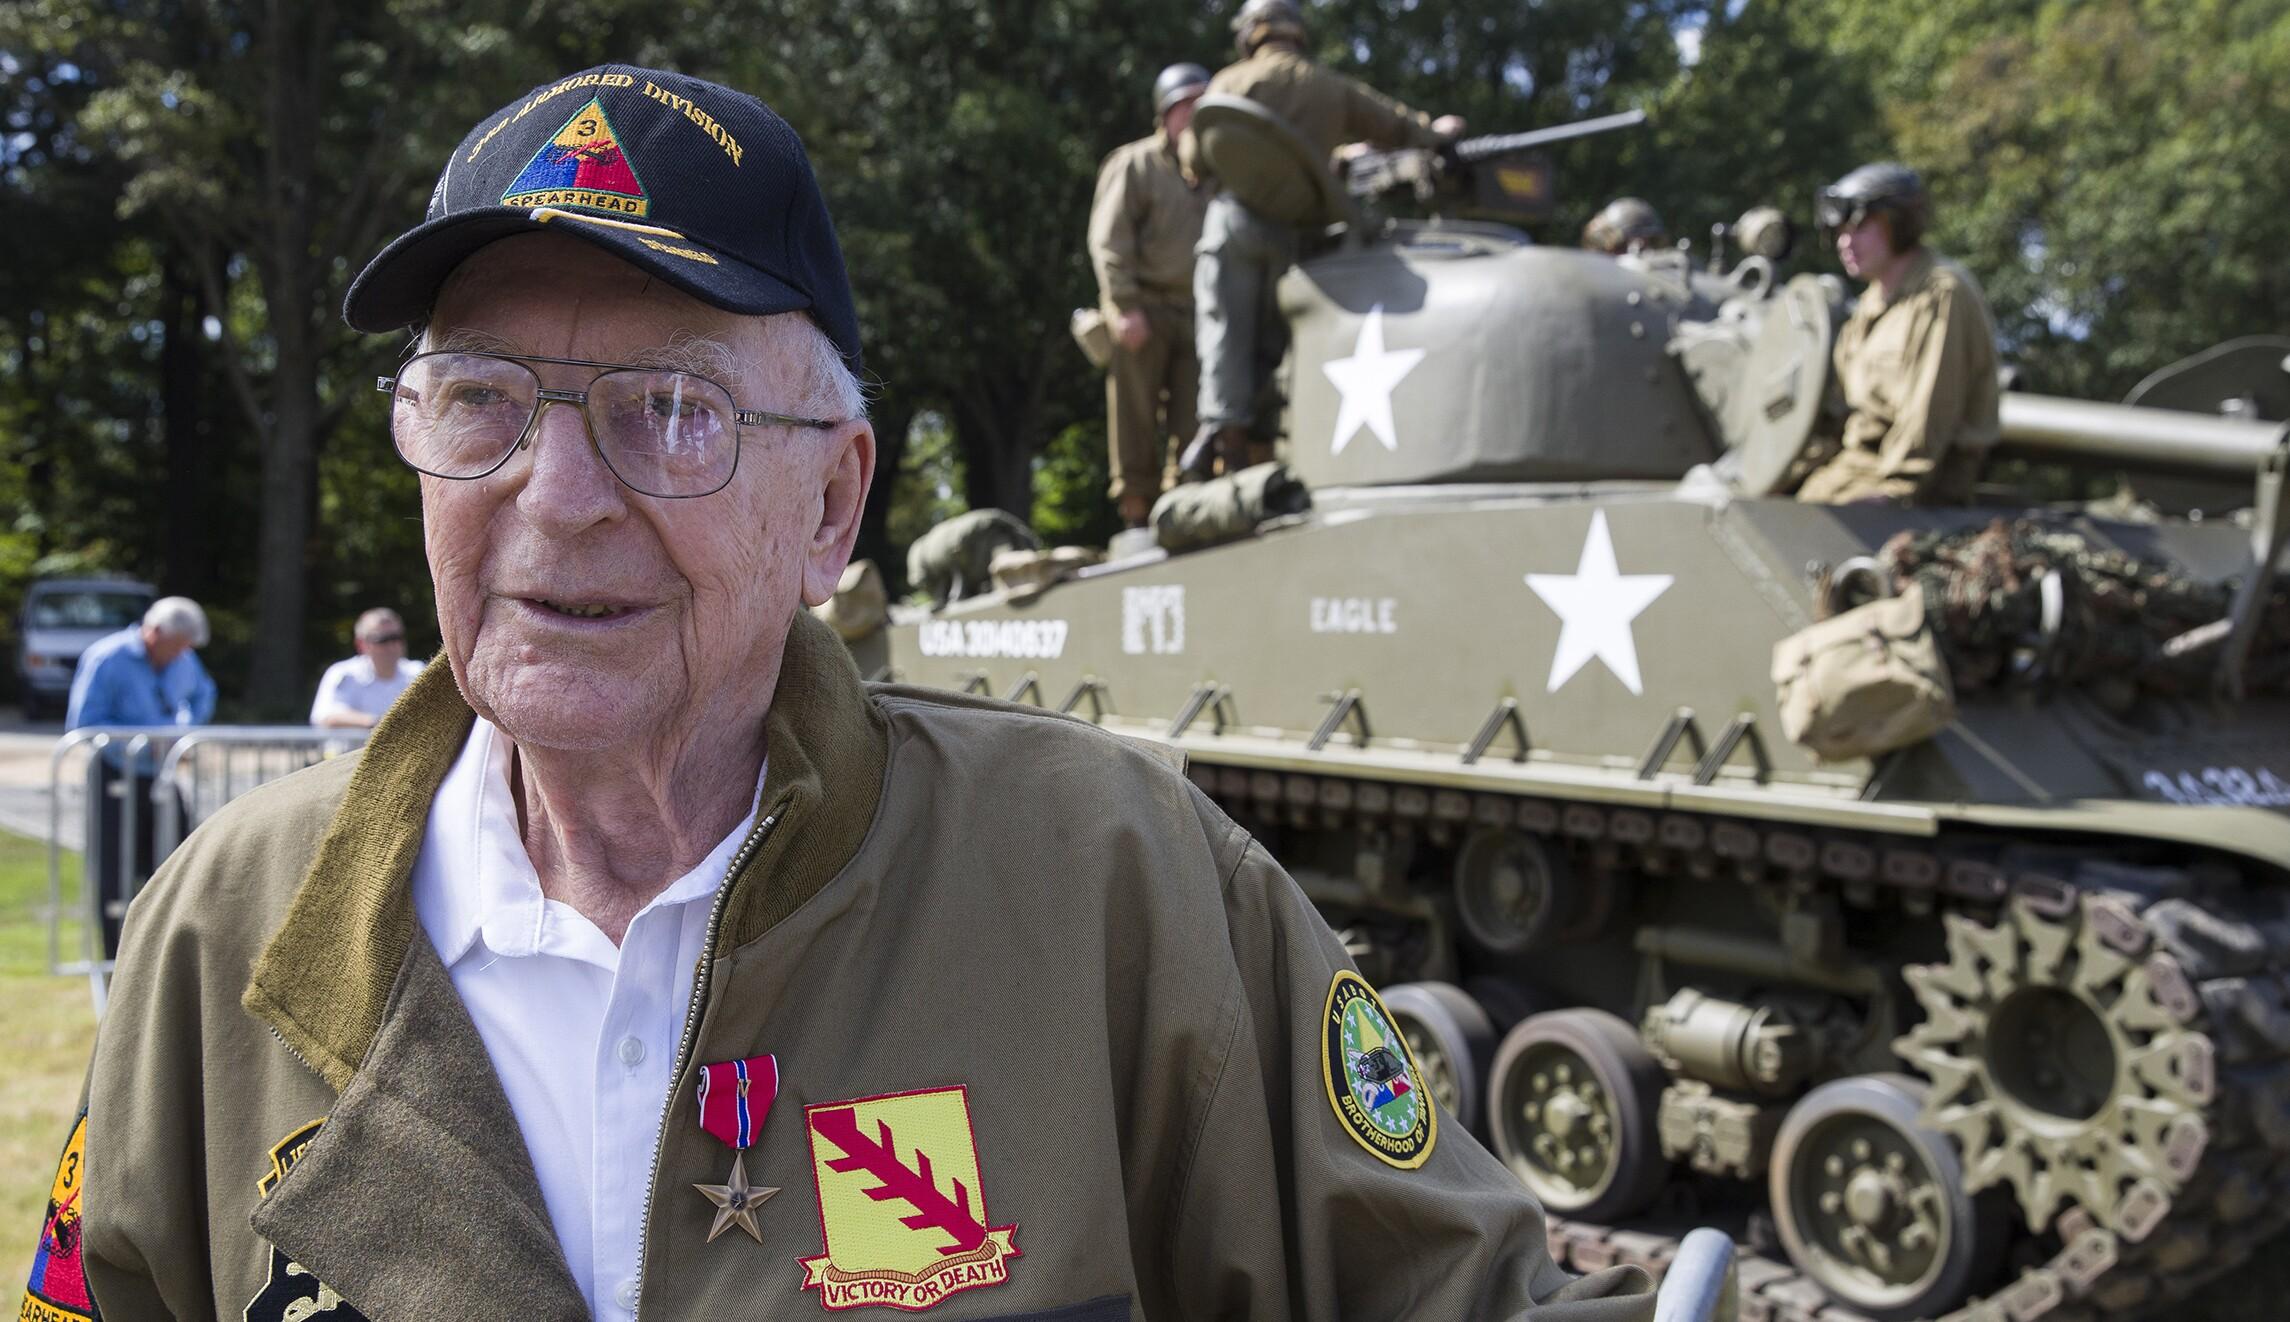 World War II gunner, 95, who took out five German tanks gets Bronze Star he forfeited for 1945 bubblegum offense